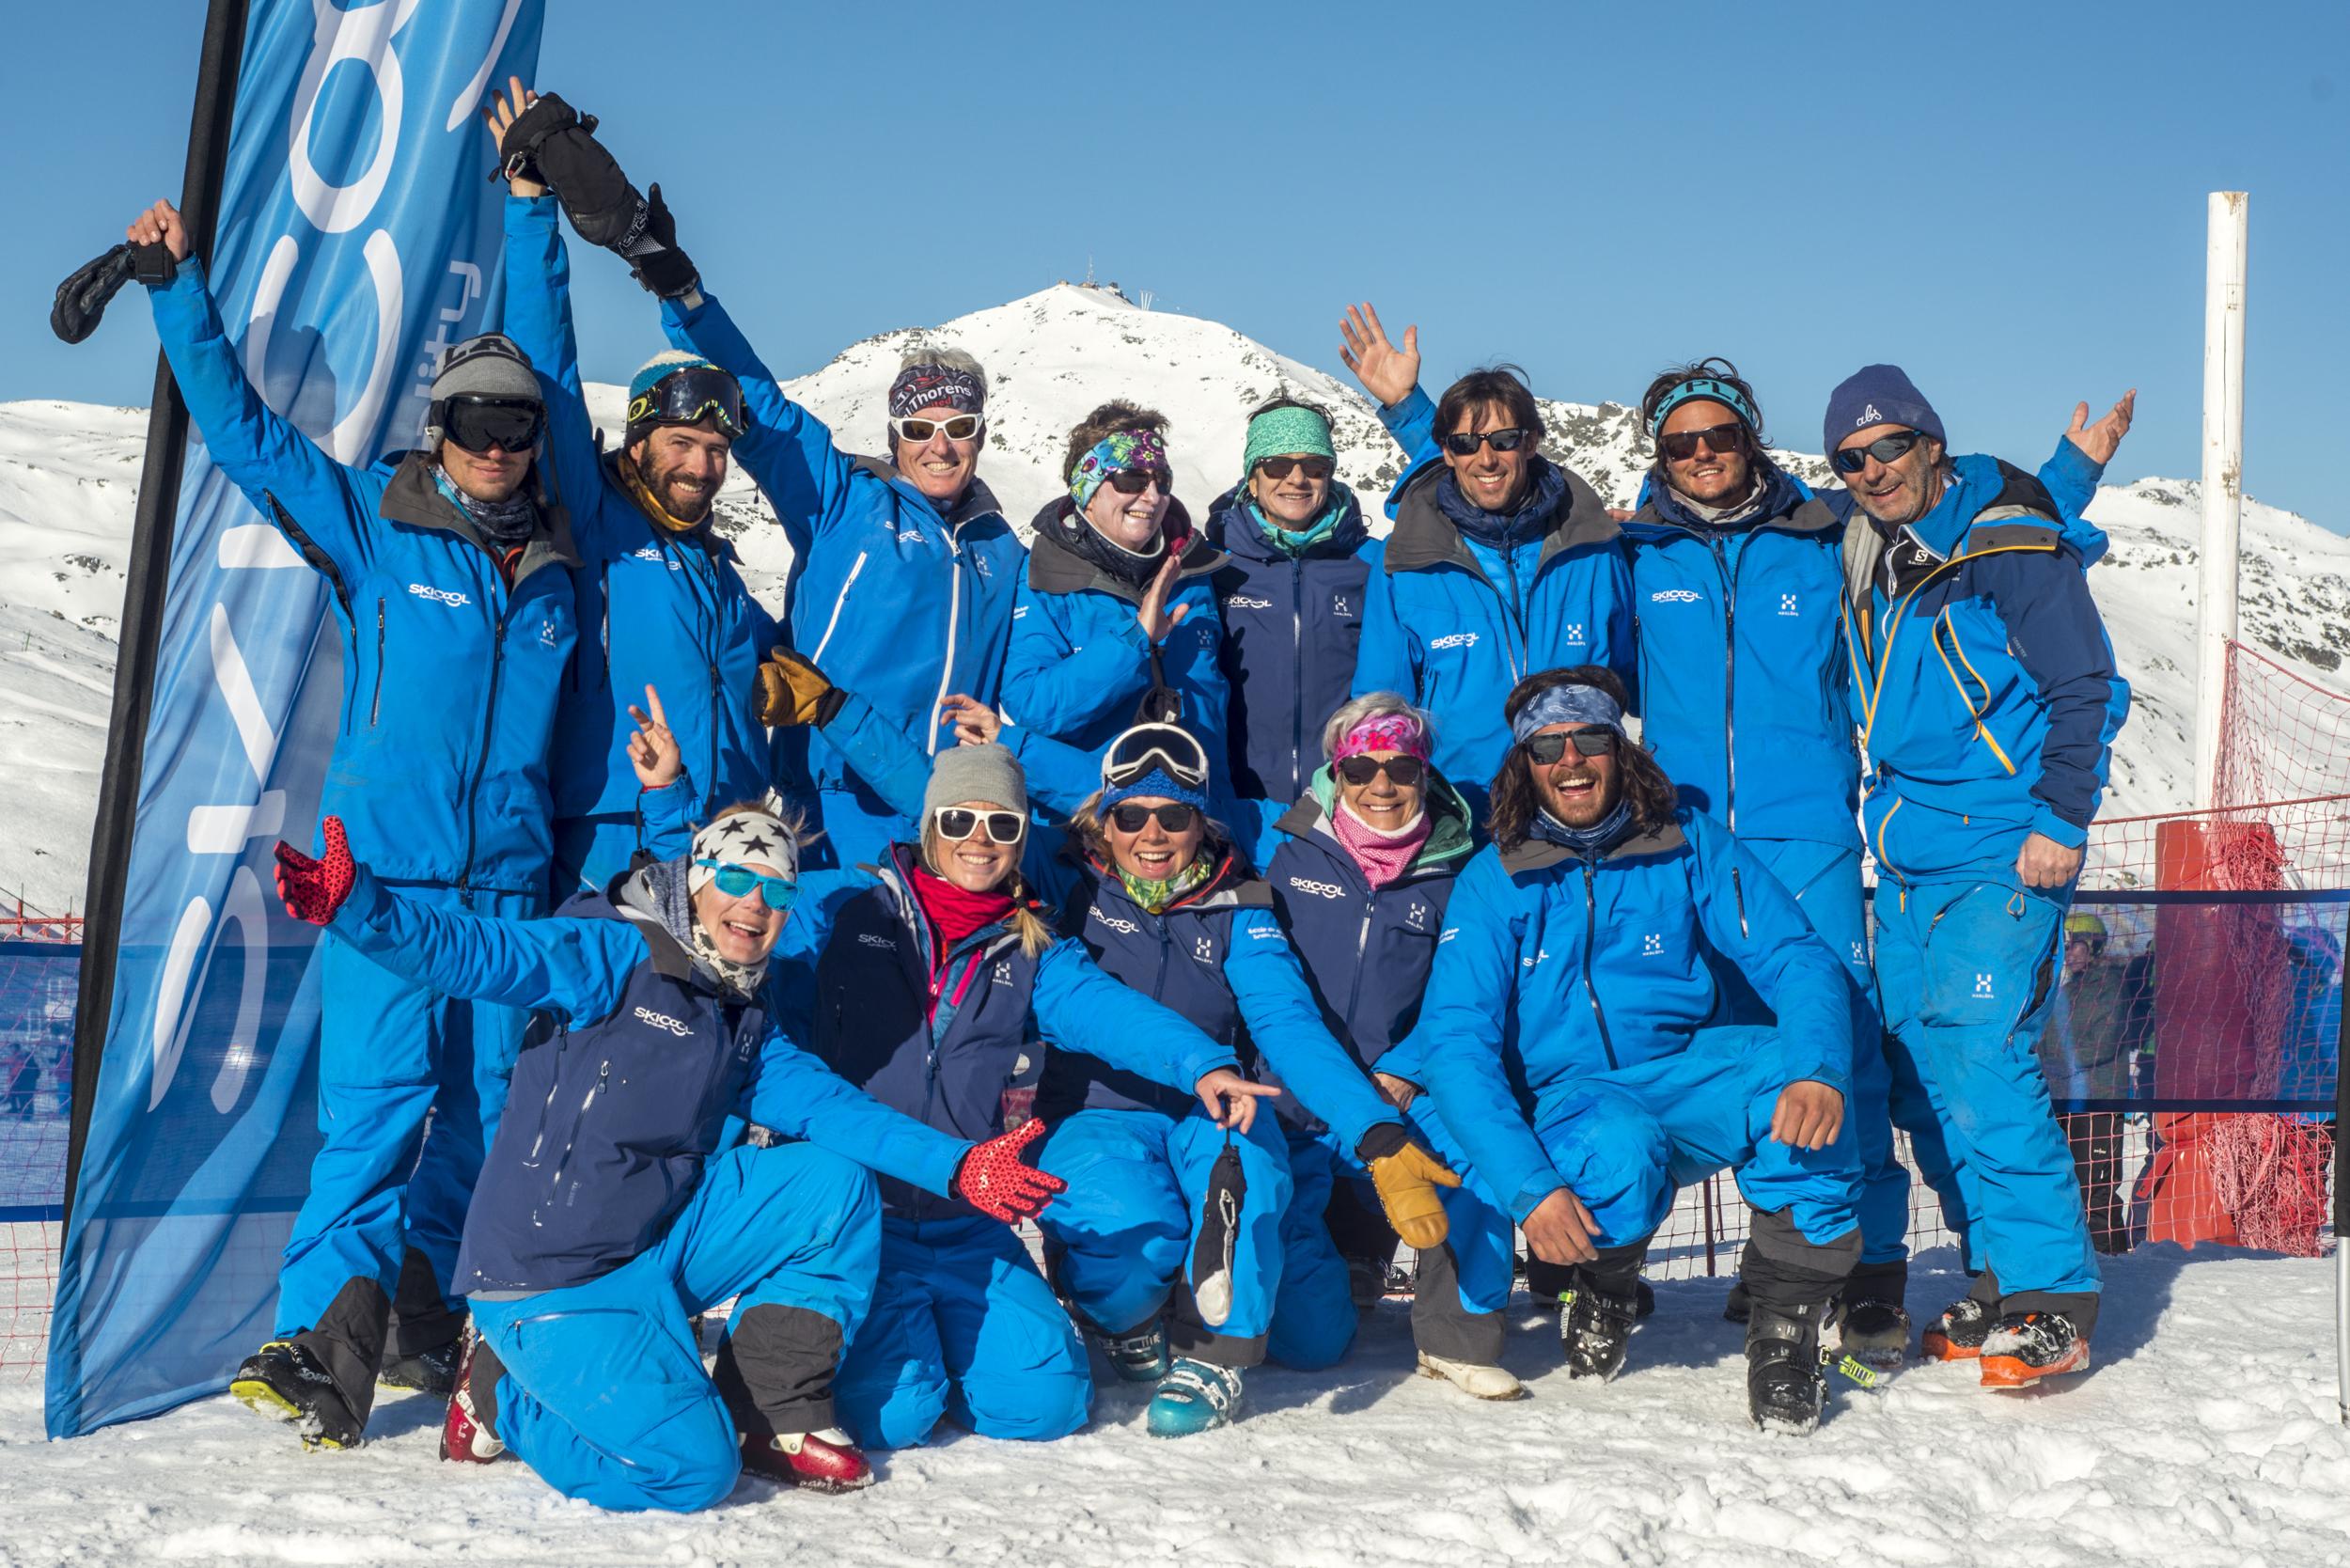 val thorens, skicool, skiing, snowboarding, snowboard, ski